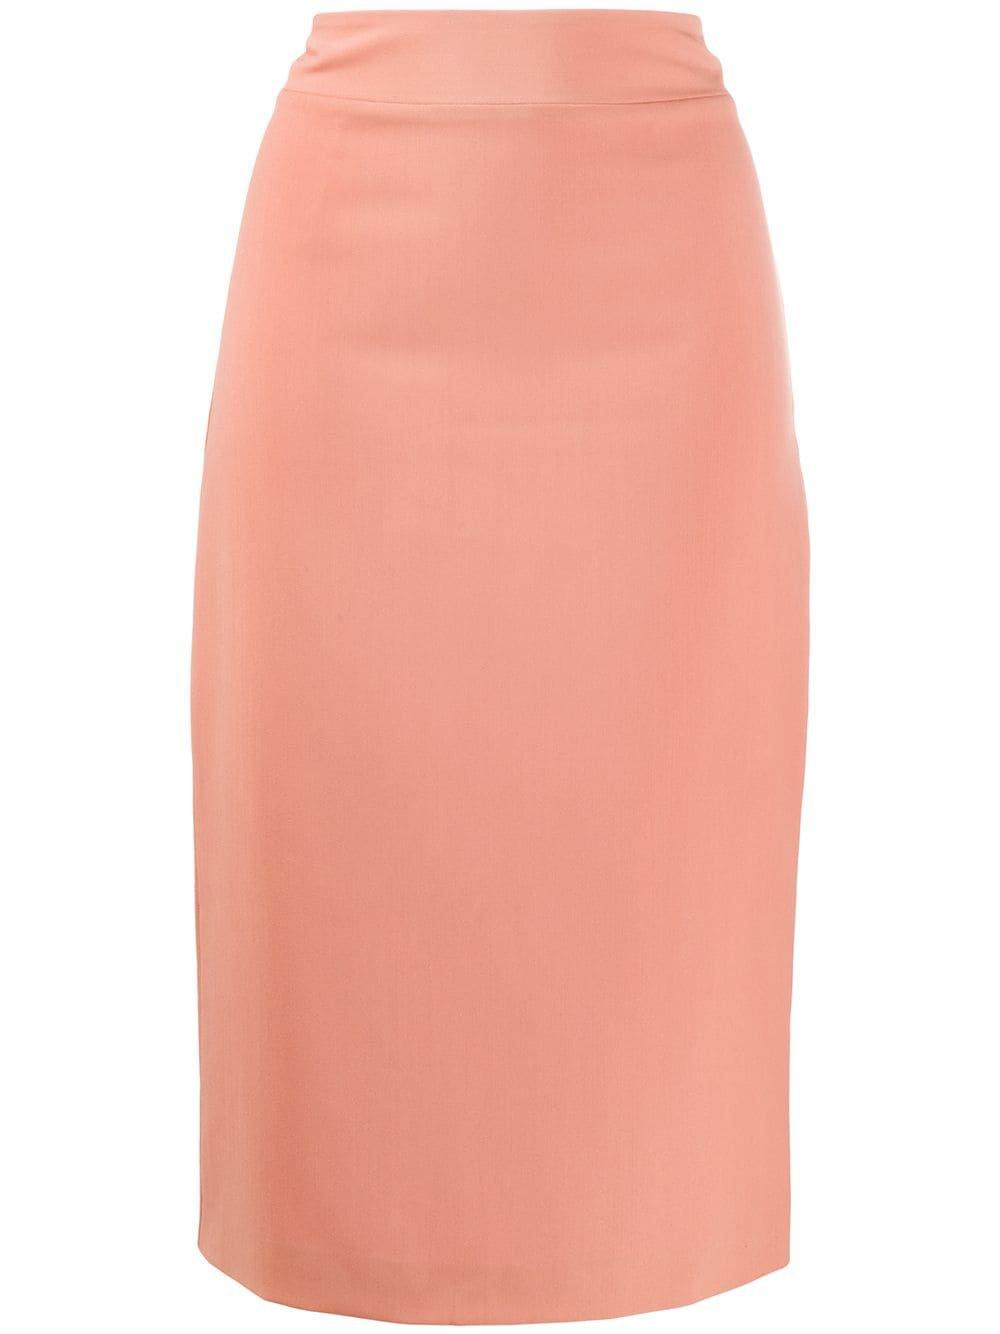 Blumarine High-Waisted Pencil Skirt